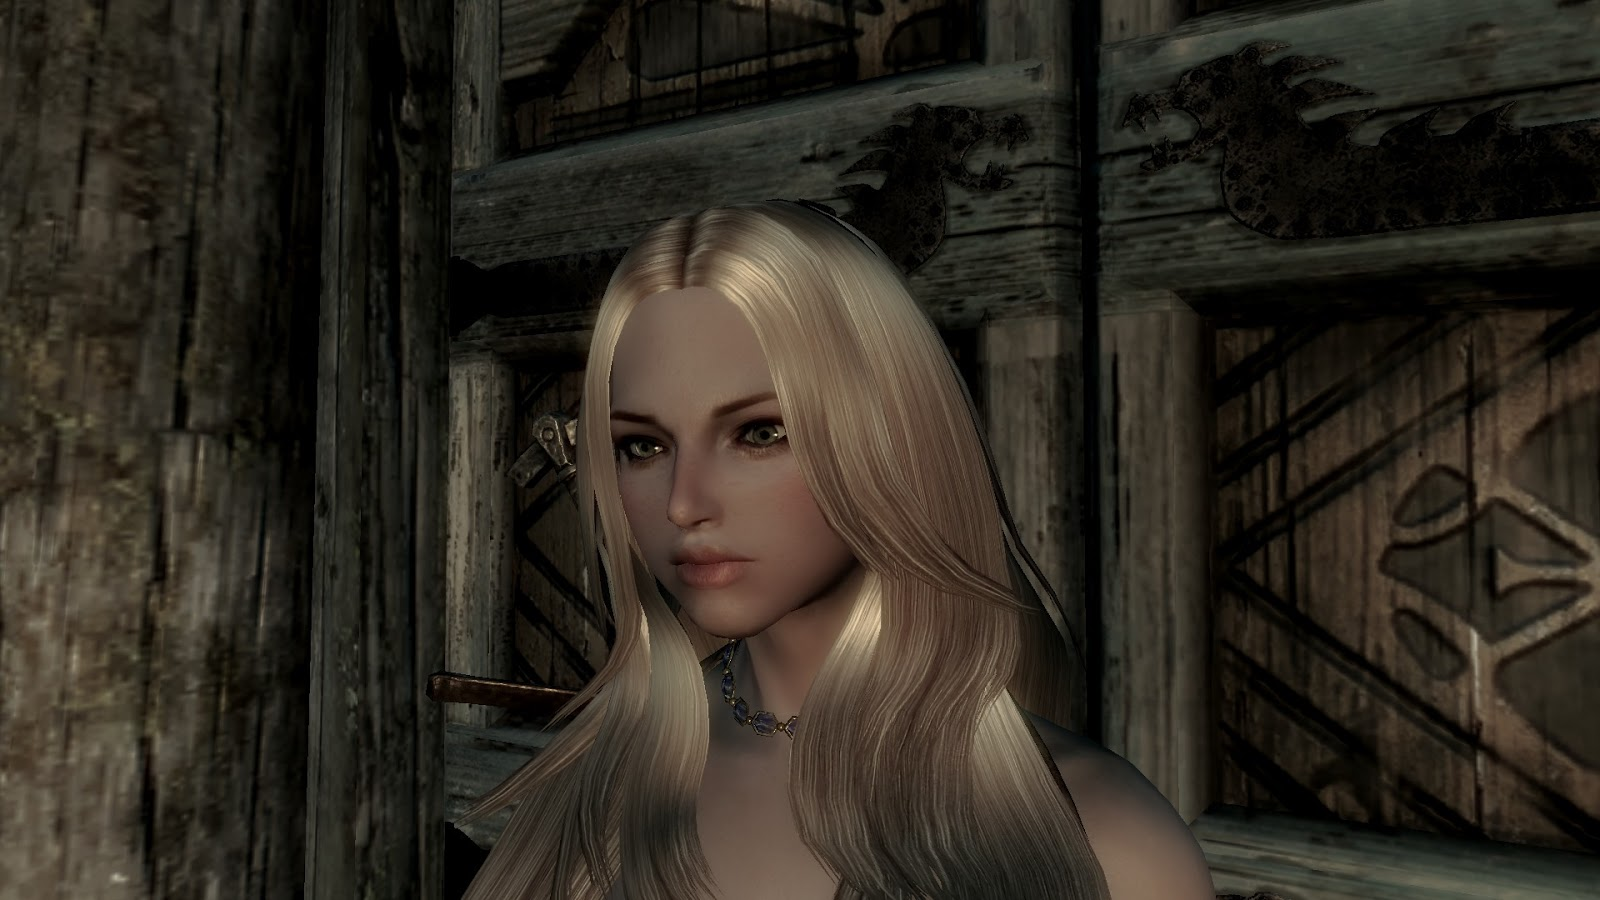 Skyrim Models: Girls of Skyrim